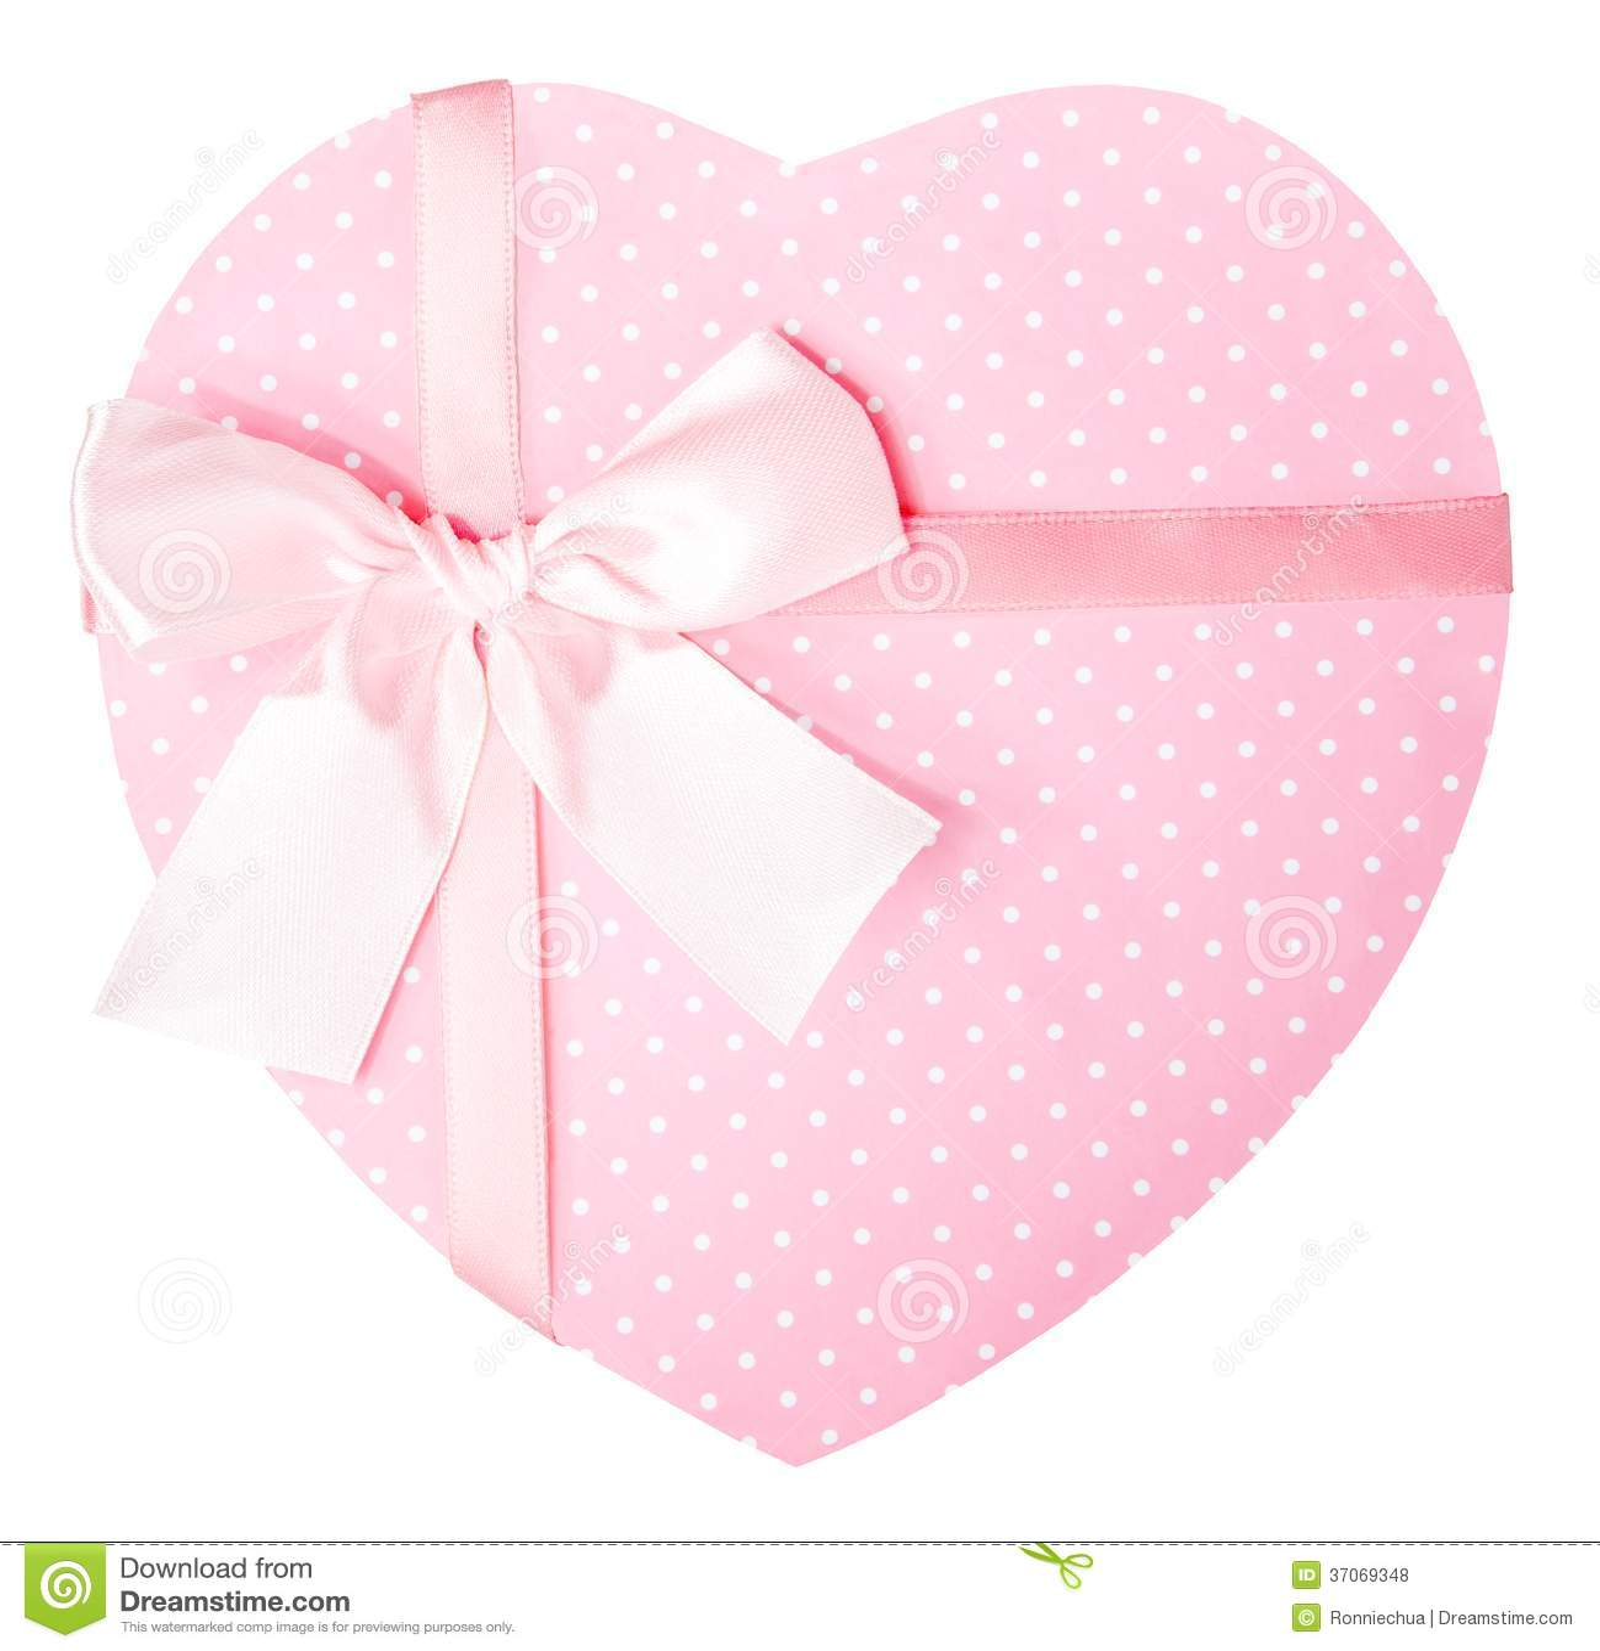 bo te cadeau en forme de coeur rose photos libres de droits image 37069348. Black Bedroom Furniture Sets. Home Design Ideas